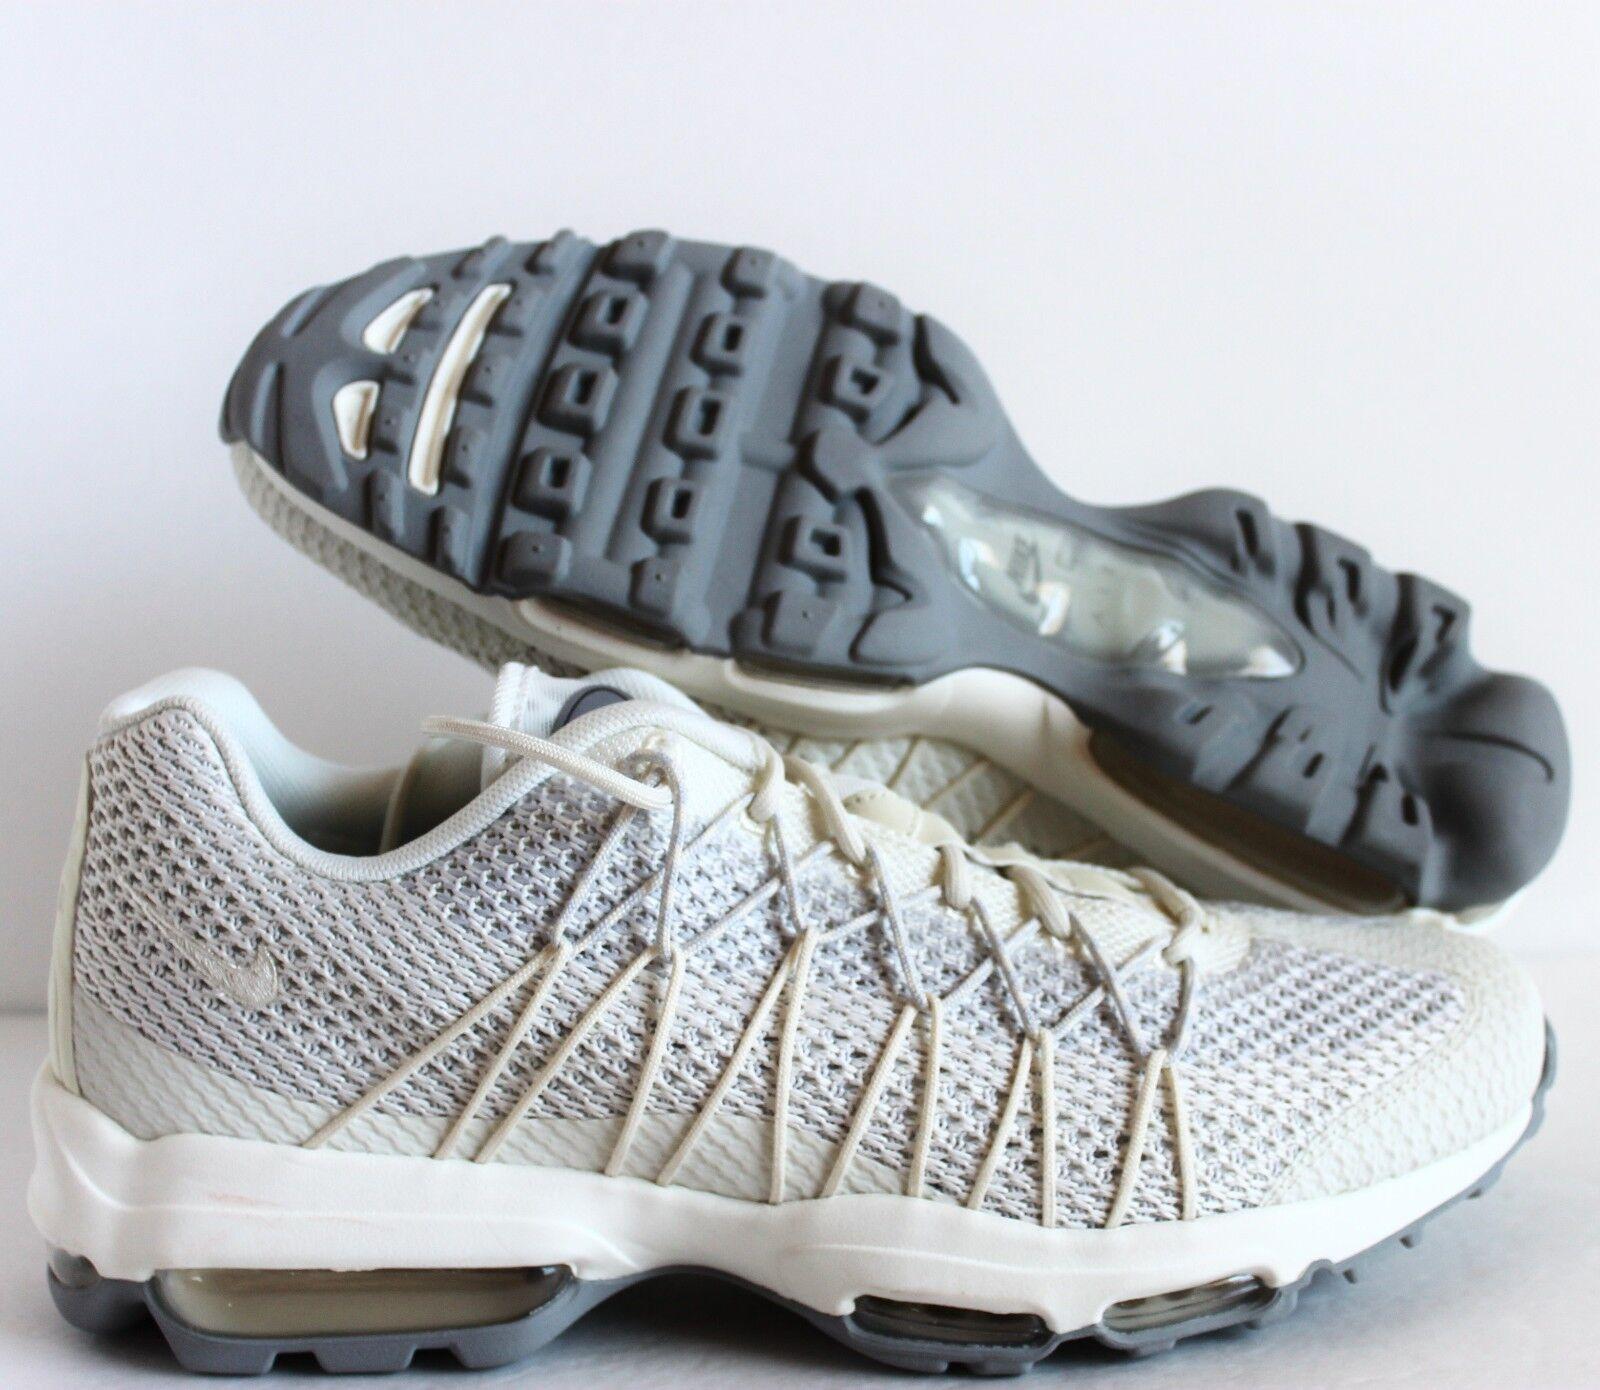 Nike air sail-platinum-white-anthracite max 95 ultra jcrd sail-platinum-white-anthracite air sz 10 [749771-102] e62d30